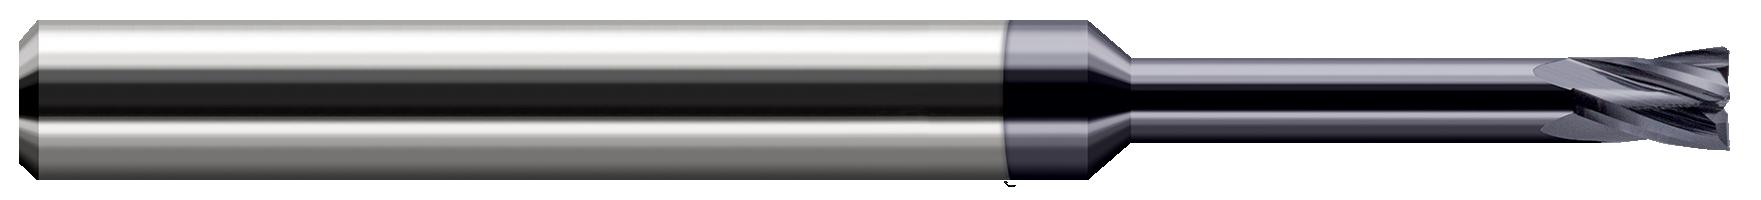 backdraft cutters - corner radius